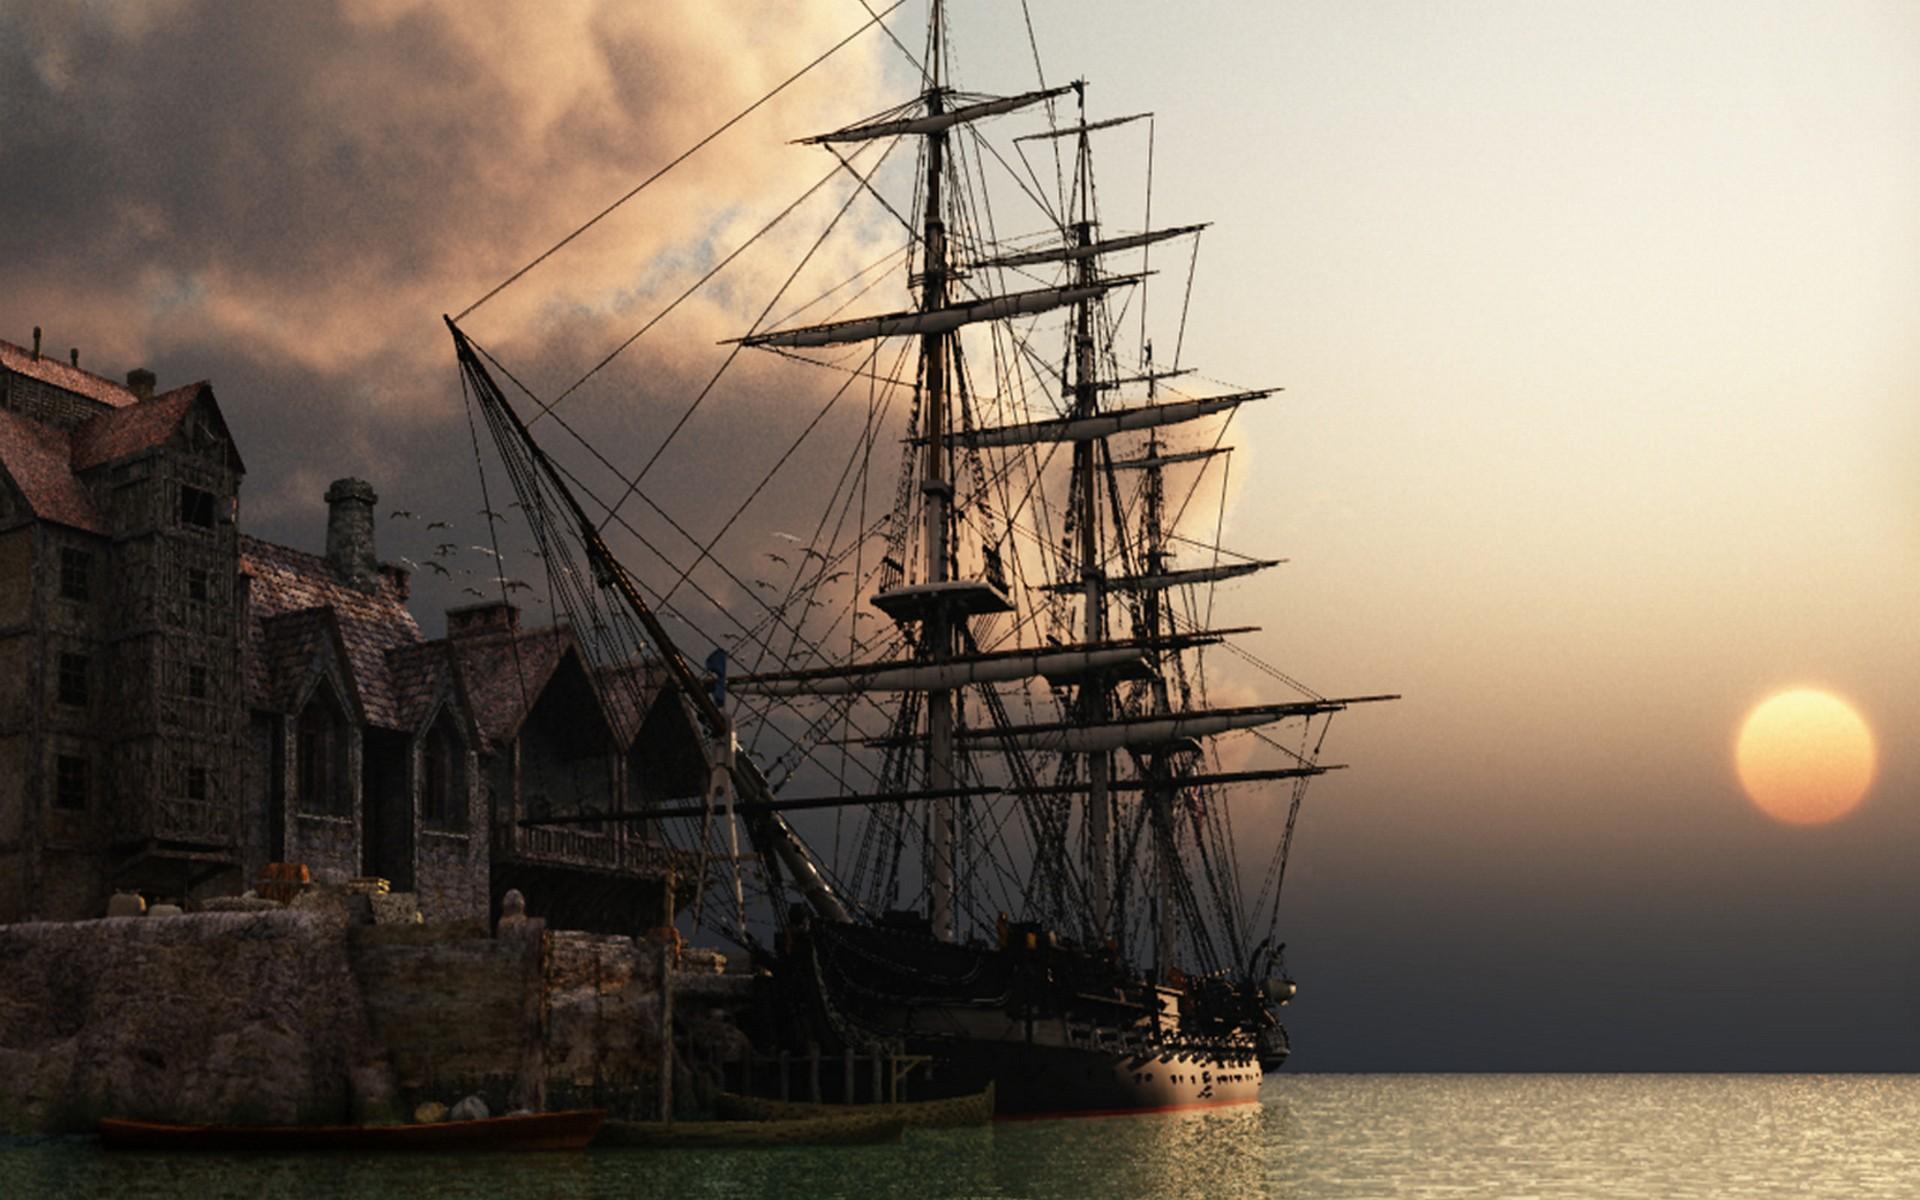 Sunset ocean ships sail ship sails wallpaper | 1920x1200 ...